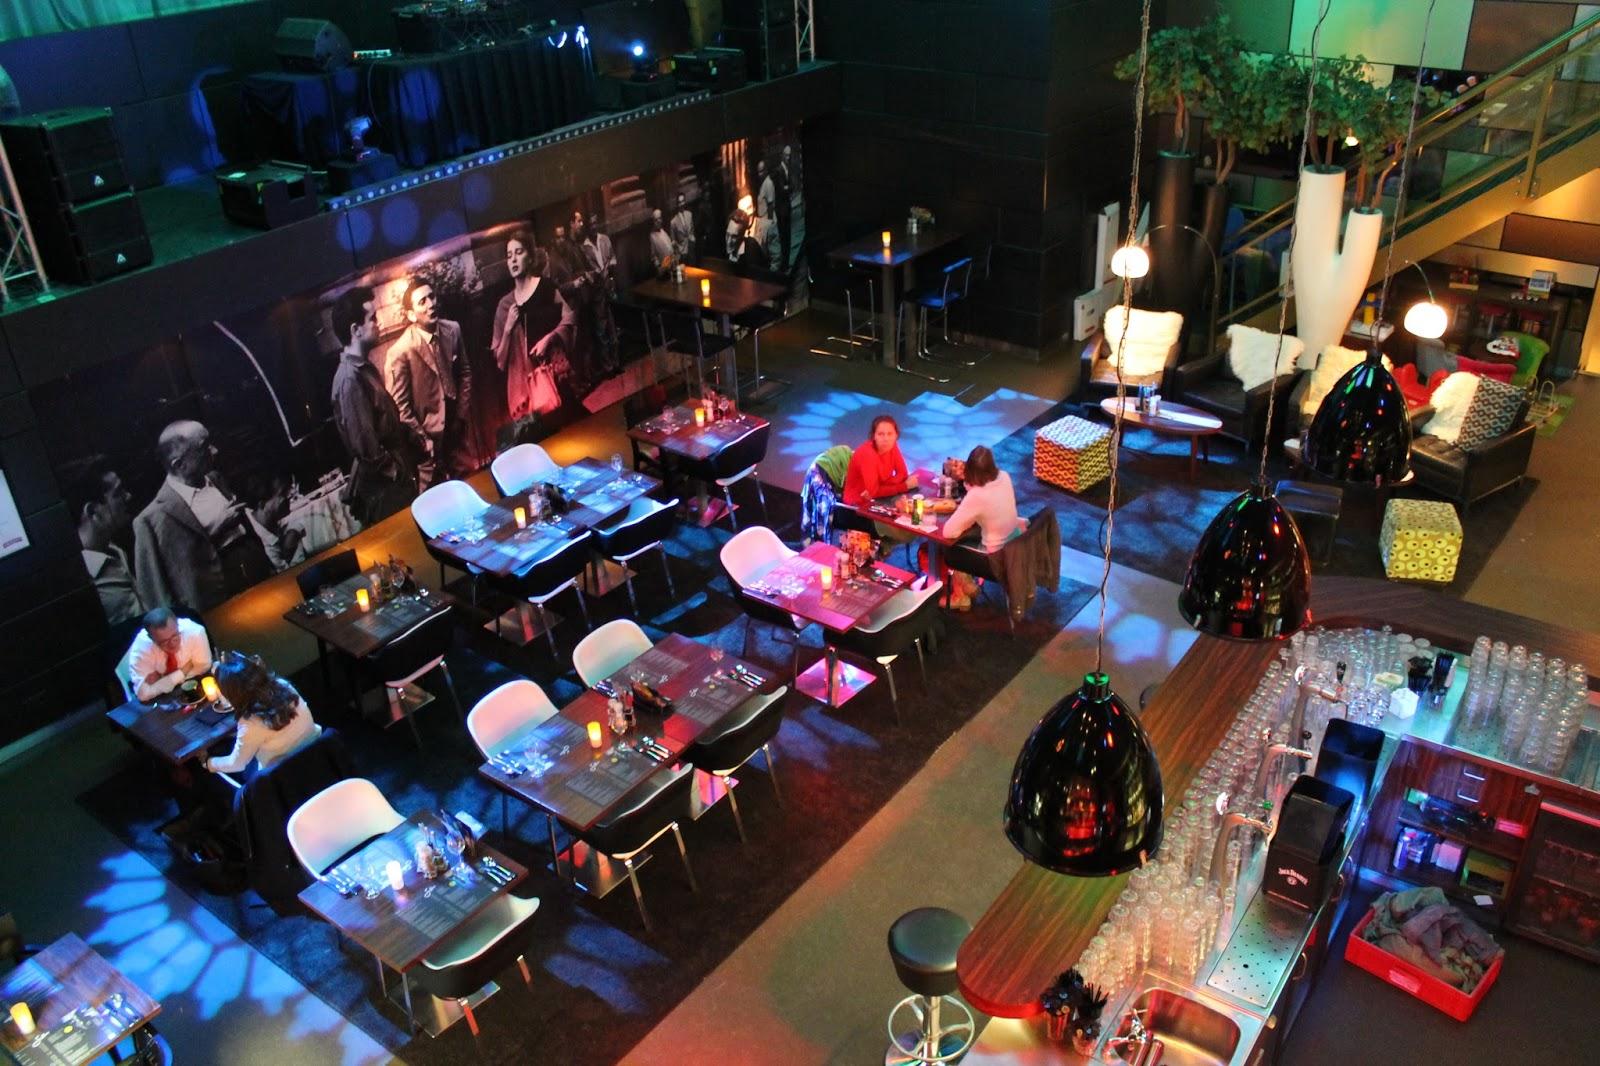 Enschede leeft fellini ontbijt lunch diner en uitgaan for Fellini enschede